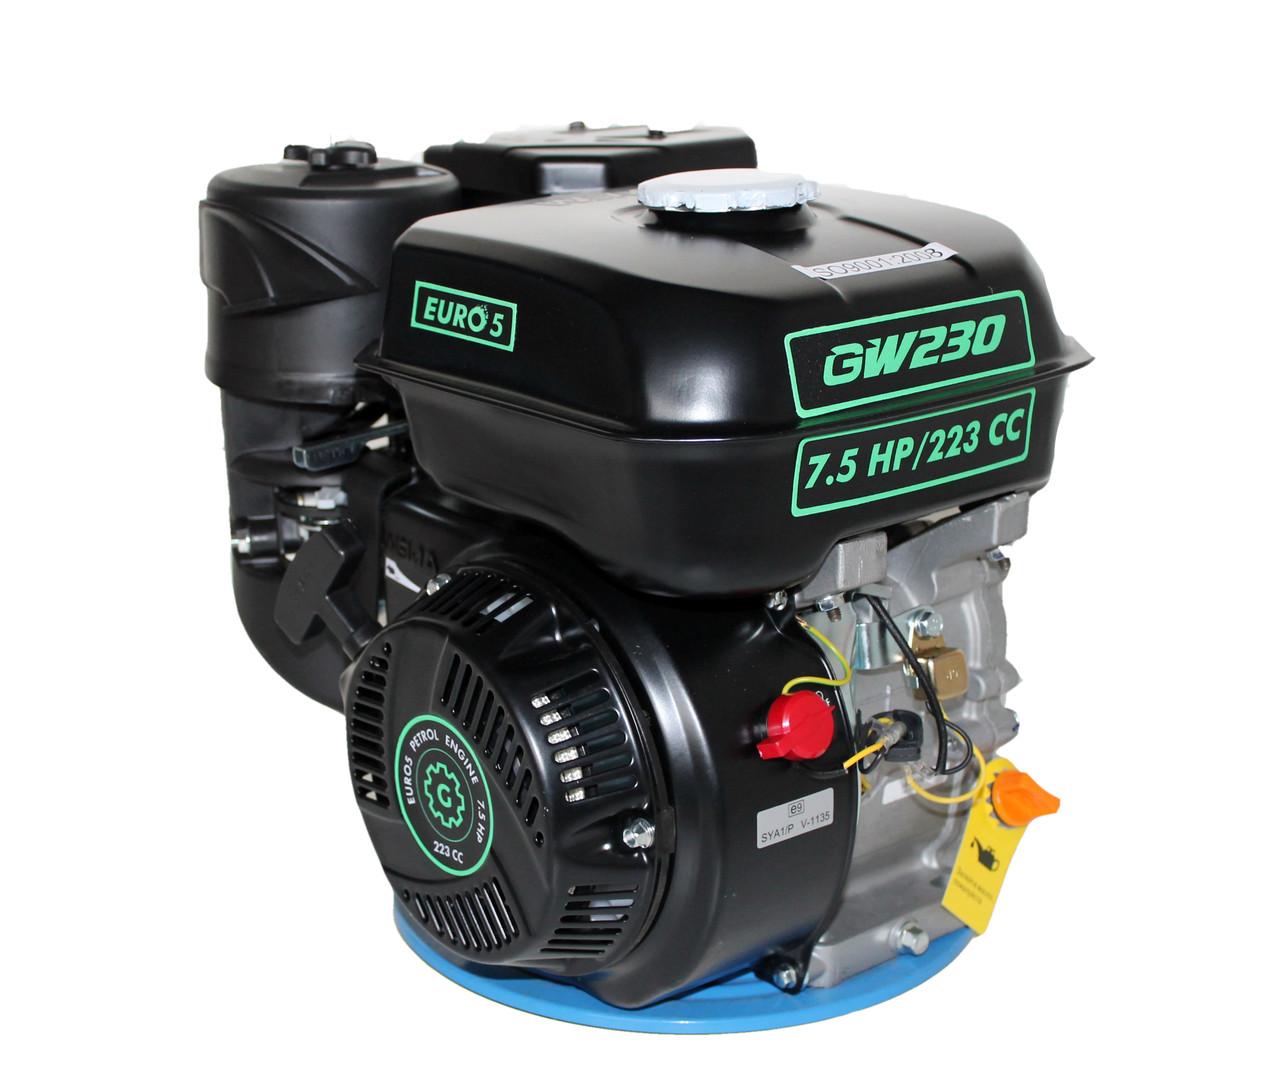 Двигун бензиновий GrunWelt 230F-Т25 NEW Євро 5 (7,5 л. с., шліци 25 мм)